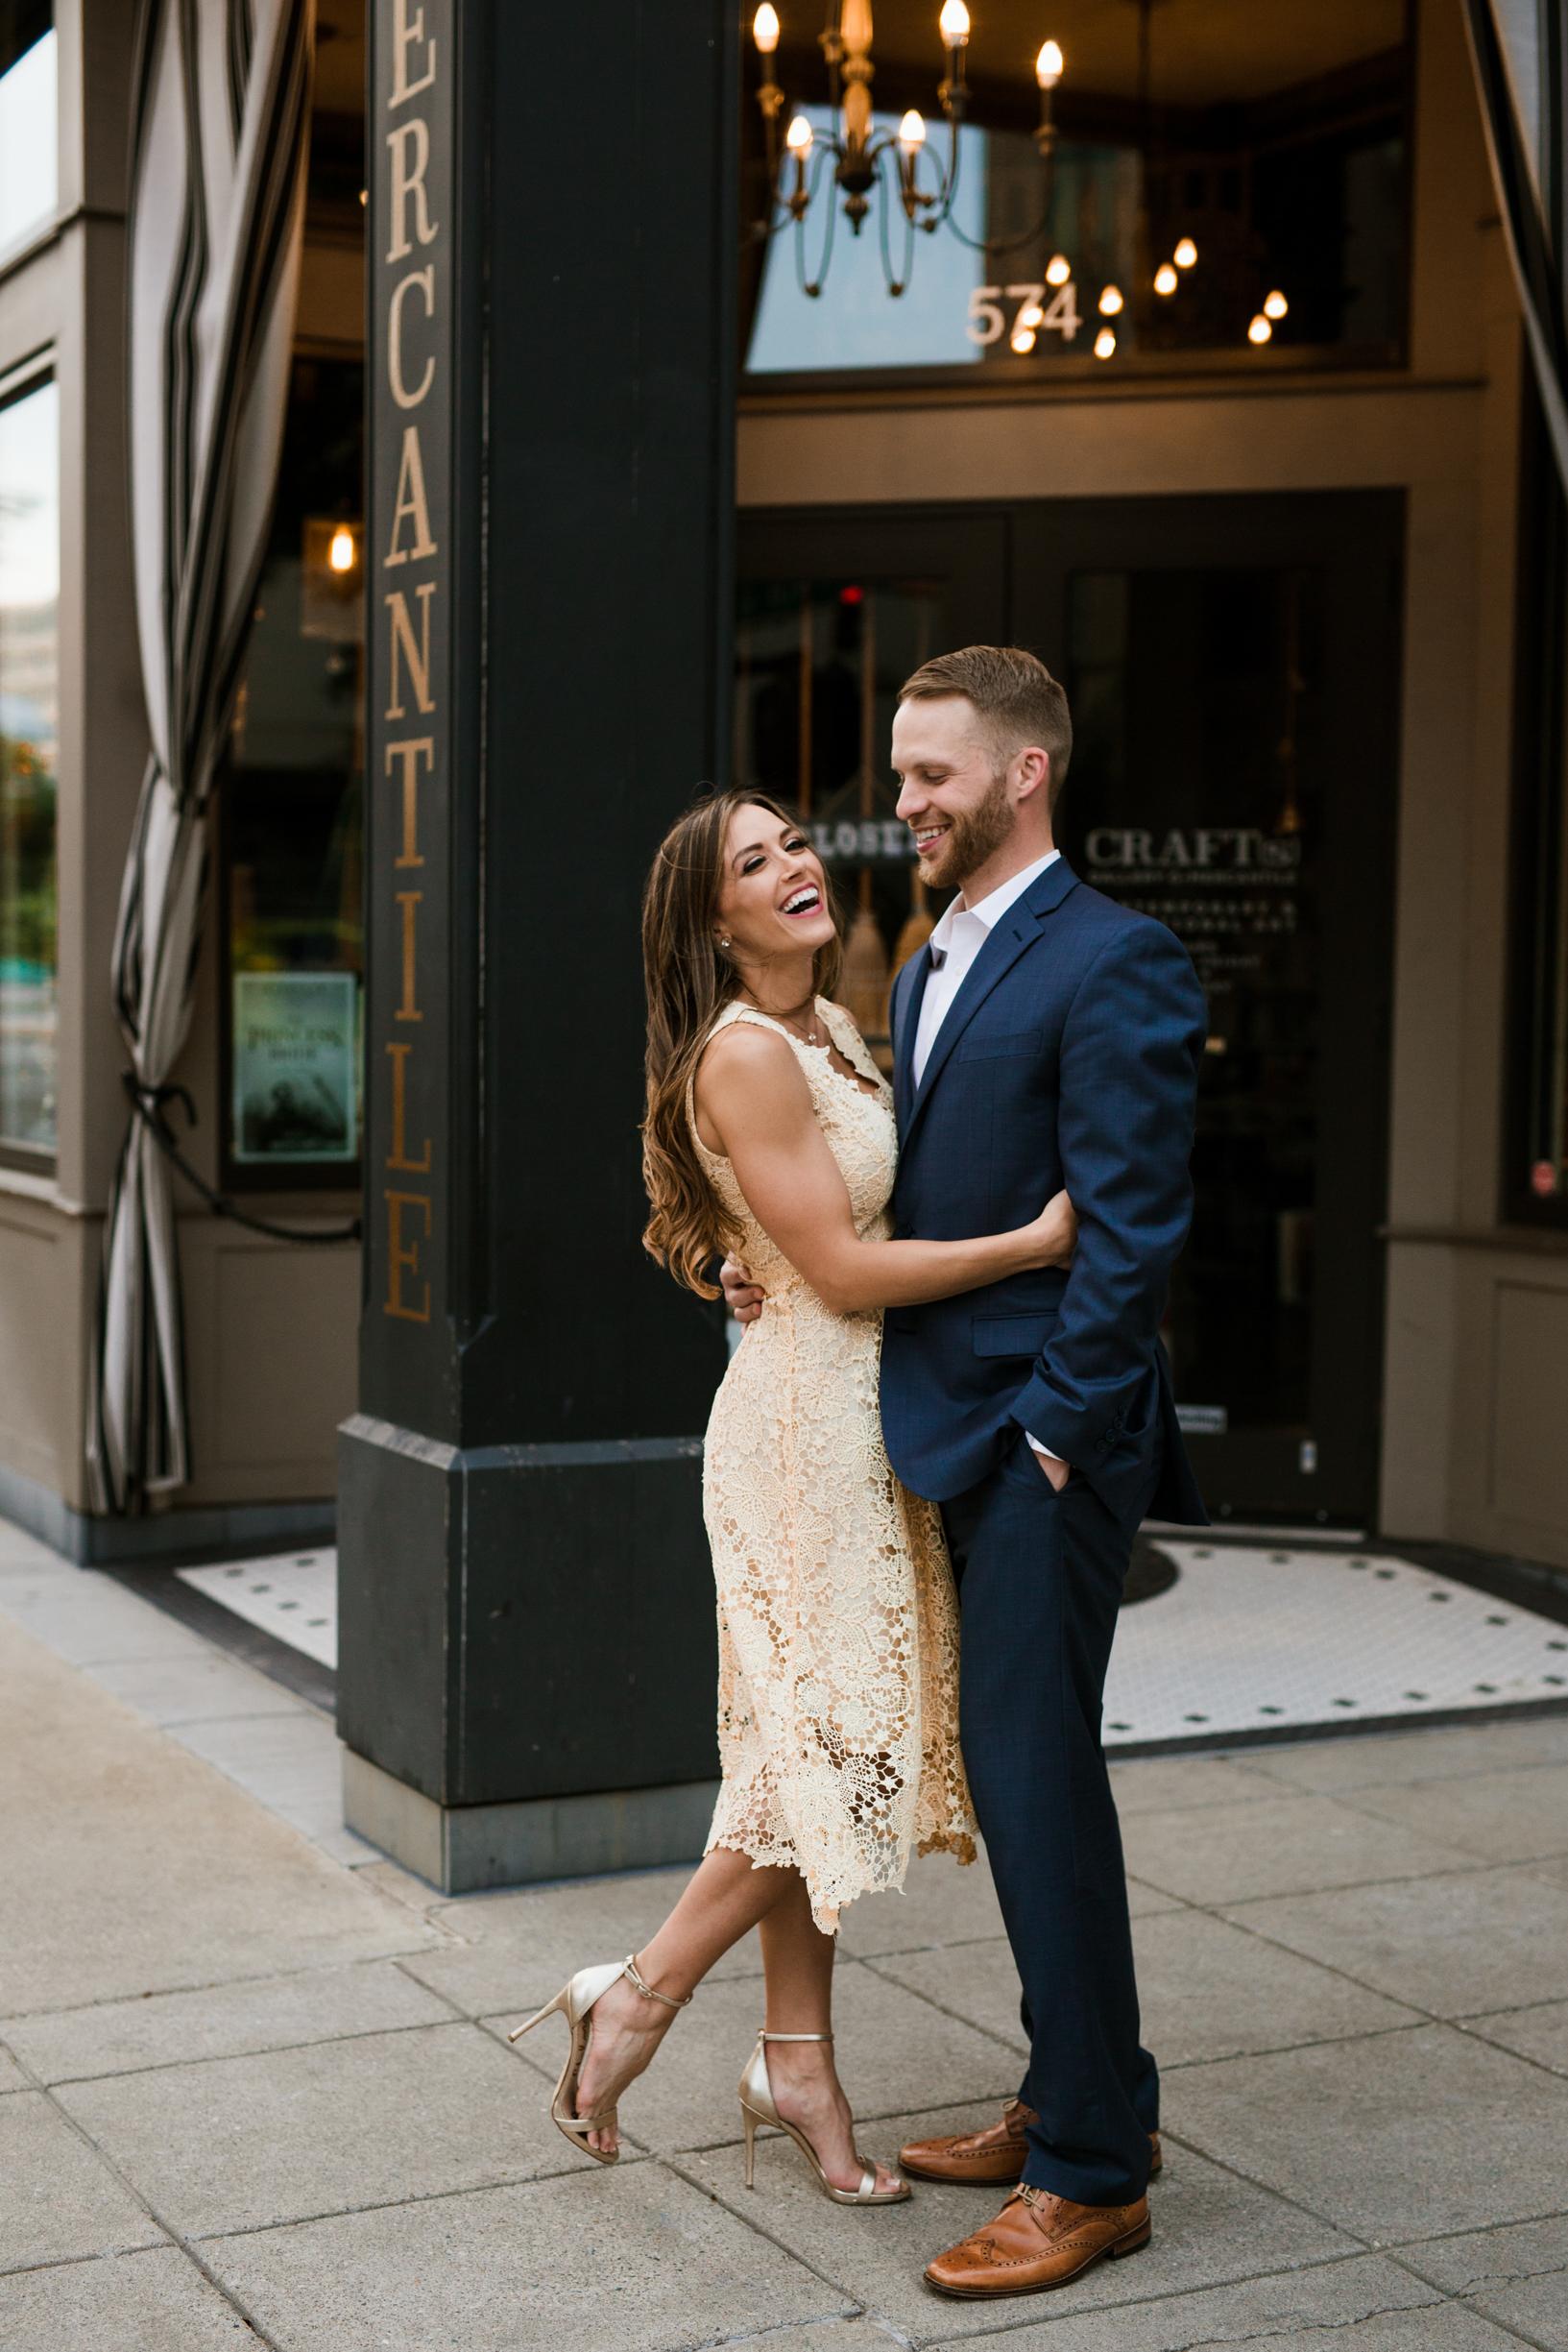 Victoria & Chad Engagement 2018 Crystal Ludwick Photo Louisville Kentucky Wedding Photographer WEBSITE (14 of 48).jpg